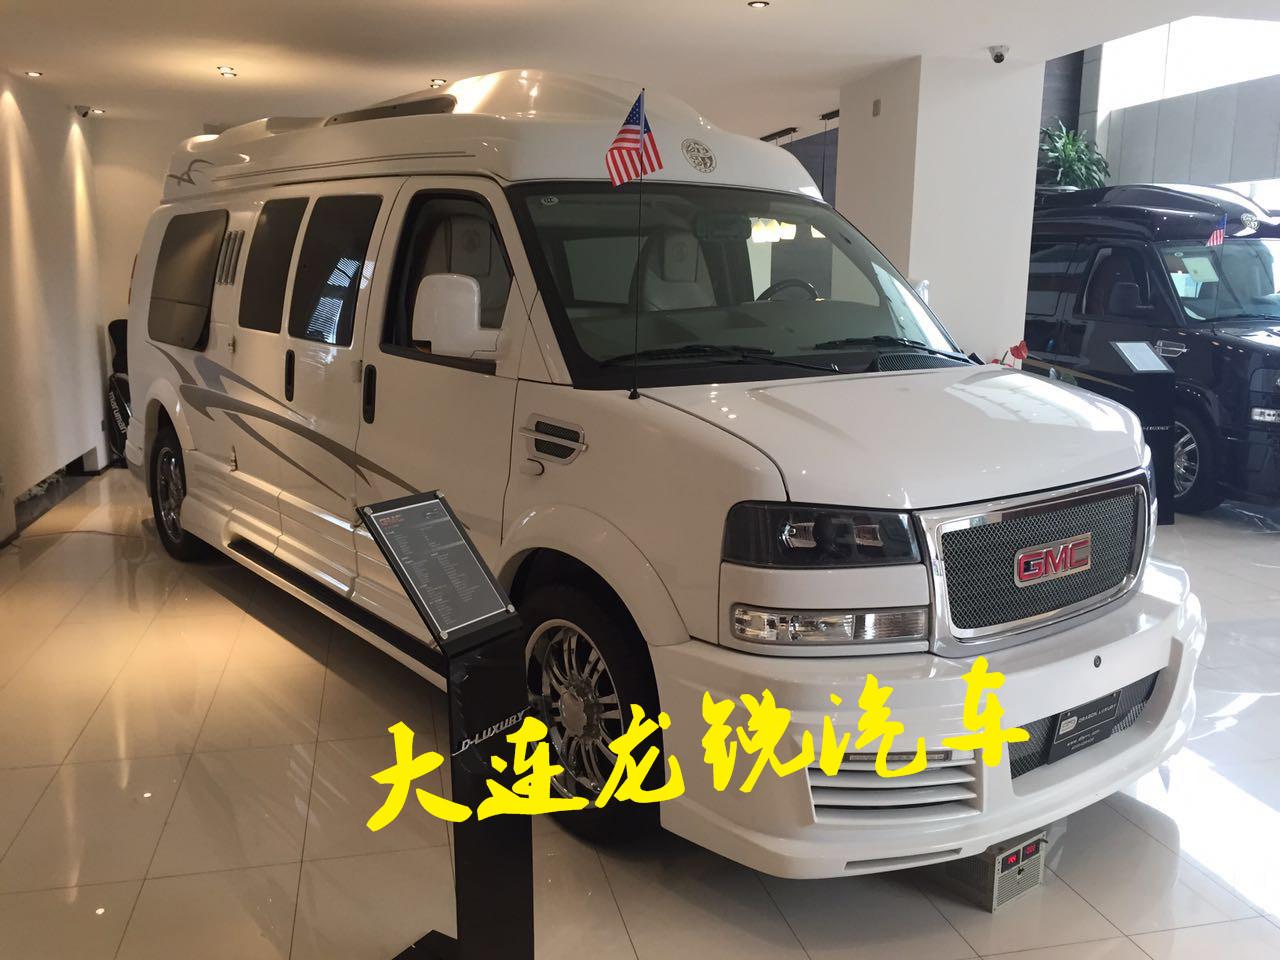 GMC房车私人定制美式进口1500特价现车-图6